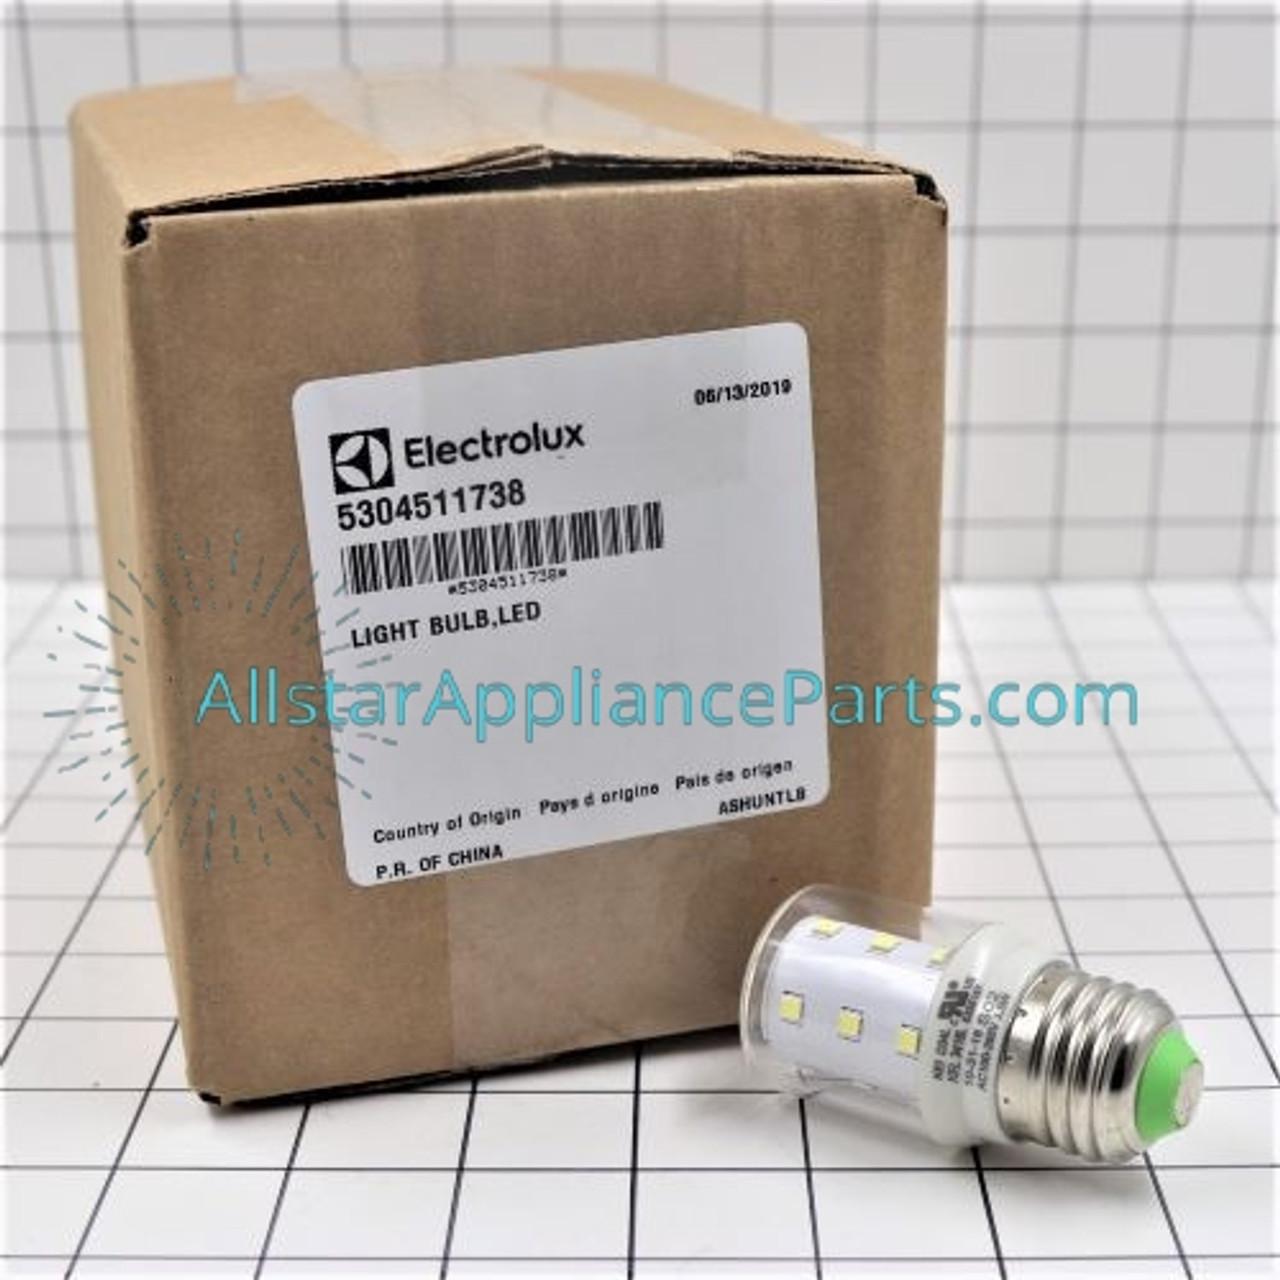 NEW Genuine Kenmore Frigidaire OEM LED Light Bulb Part # 5304498578 5304495326